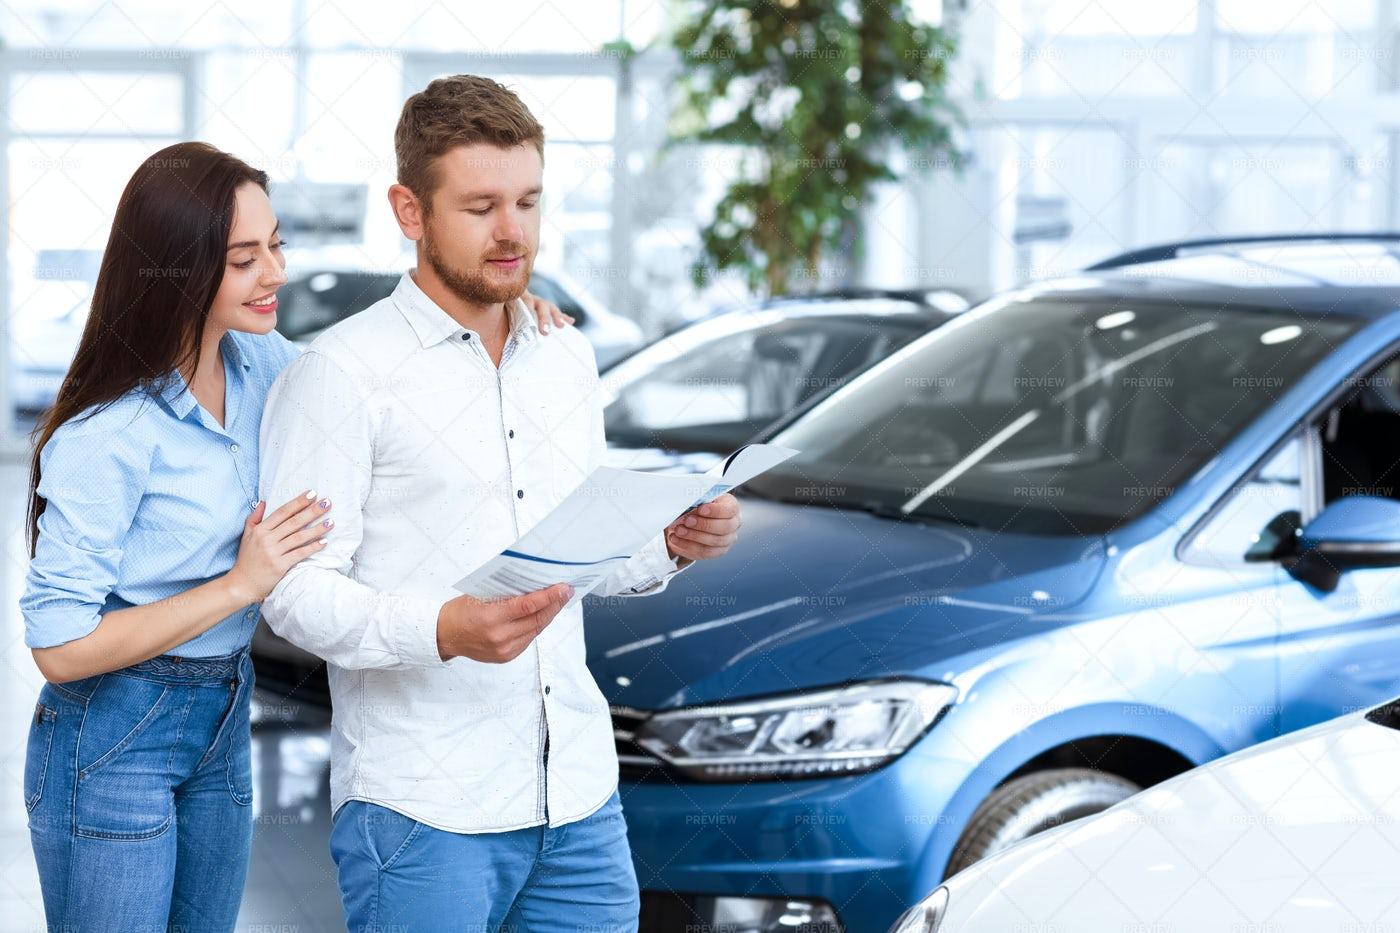 Looking At Car Catalogue: Stock Photos